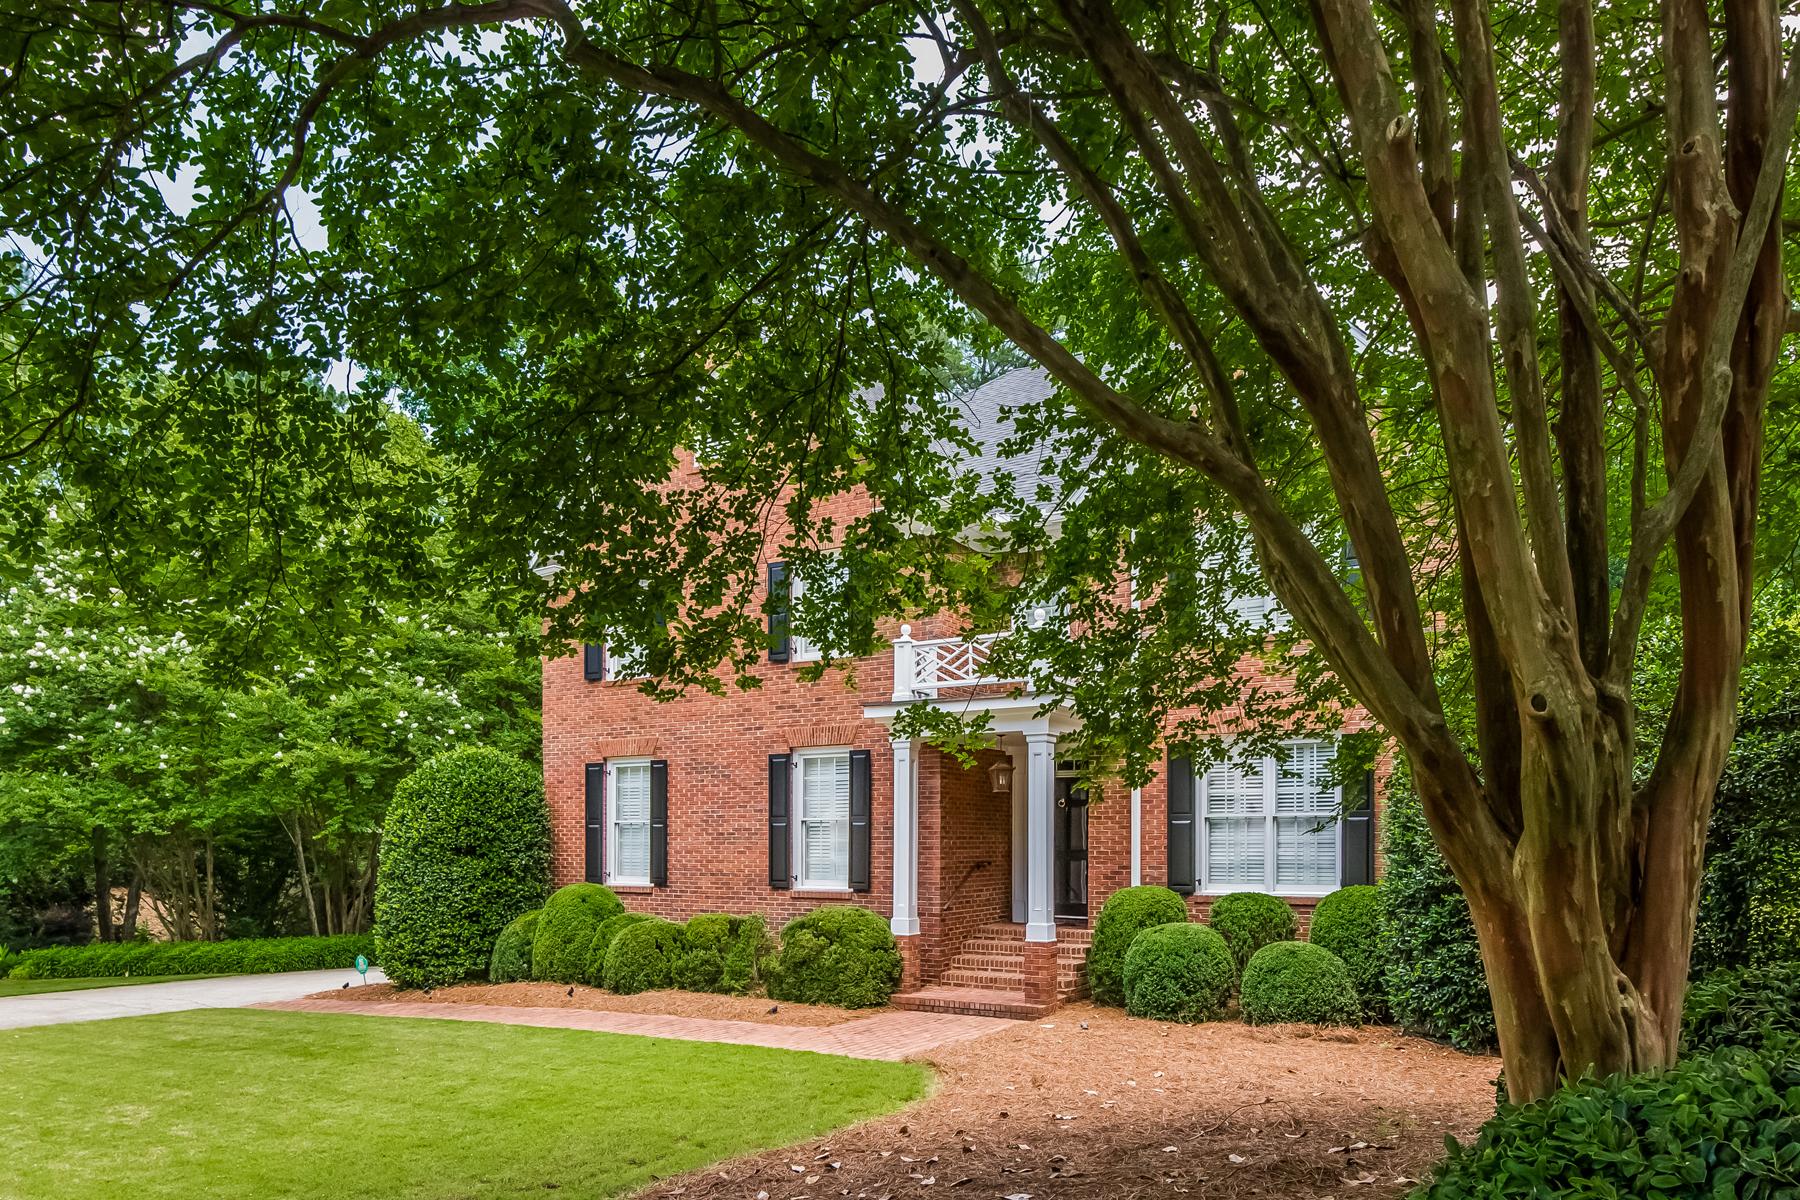 Spacious Brick Home In Vinings 4309 Orchard Valley Dr Atlanta, Georgia 30339 Hoa Kỳ